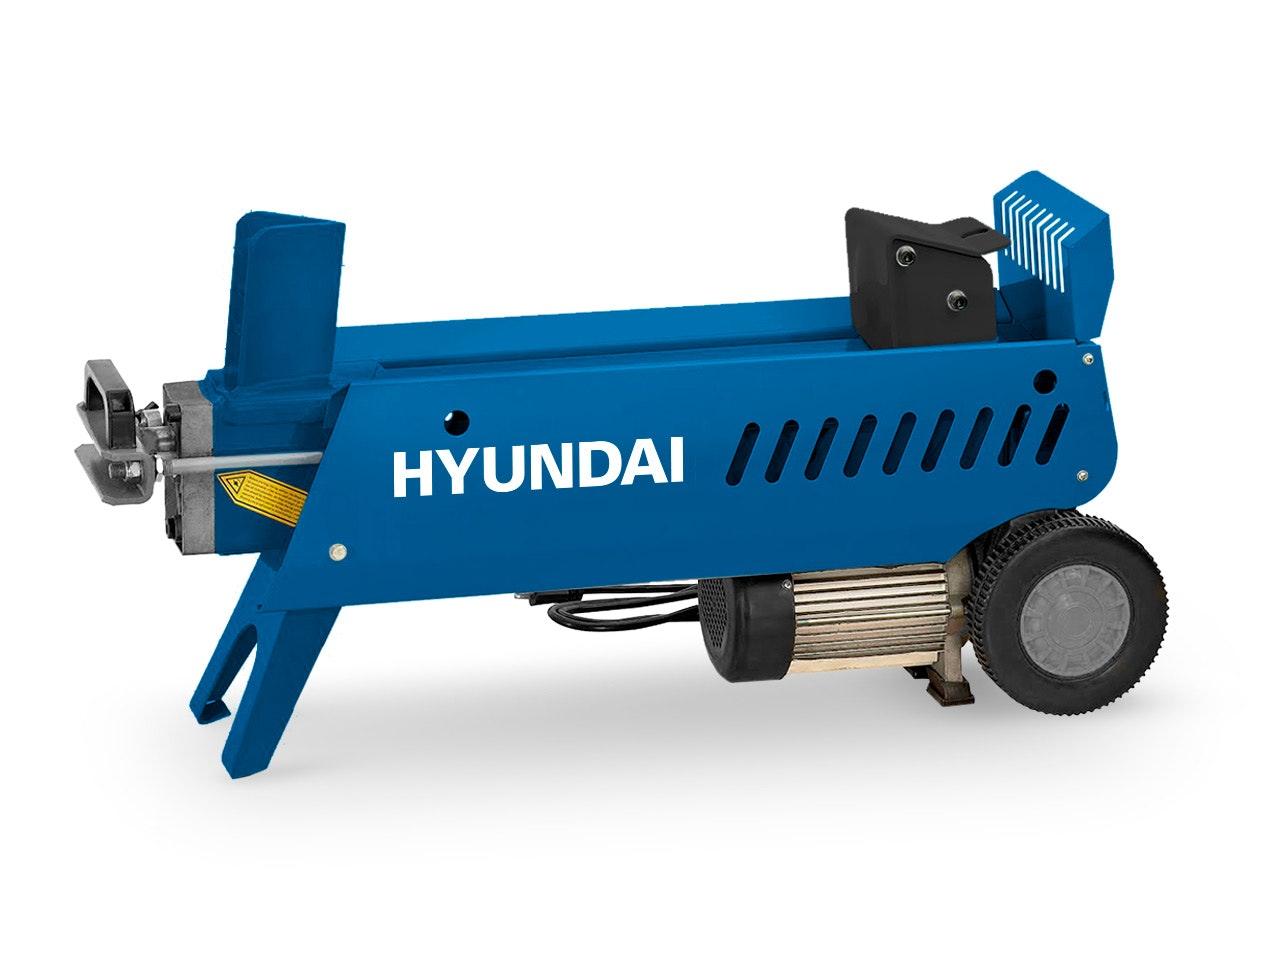 Hyundai Log Splitter 7T Electric